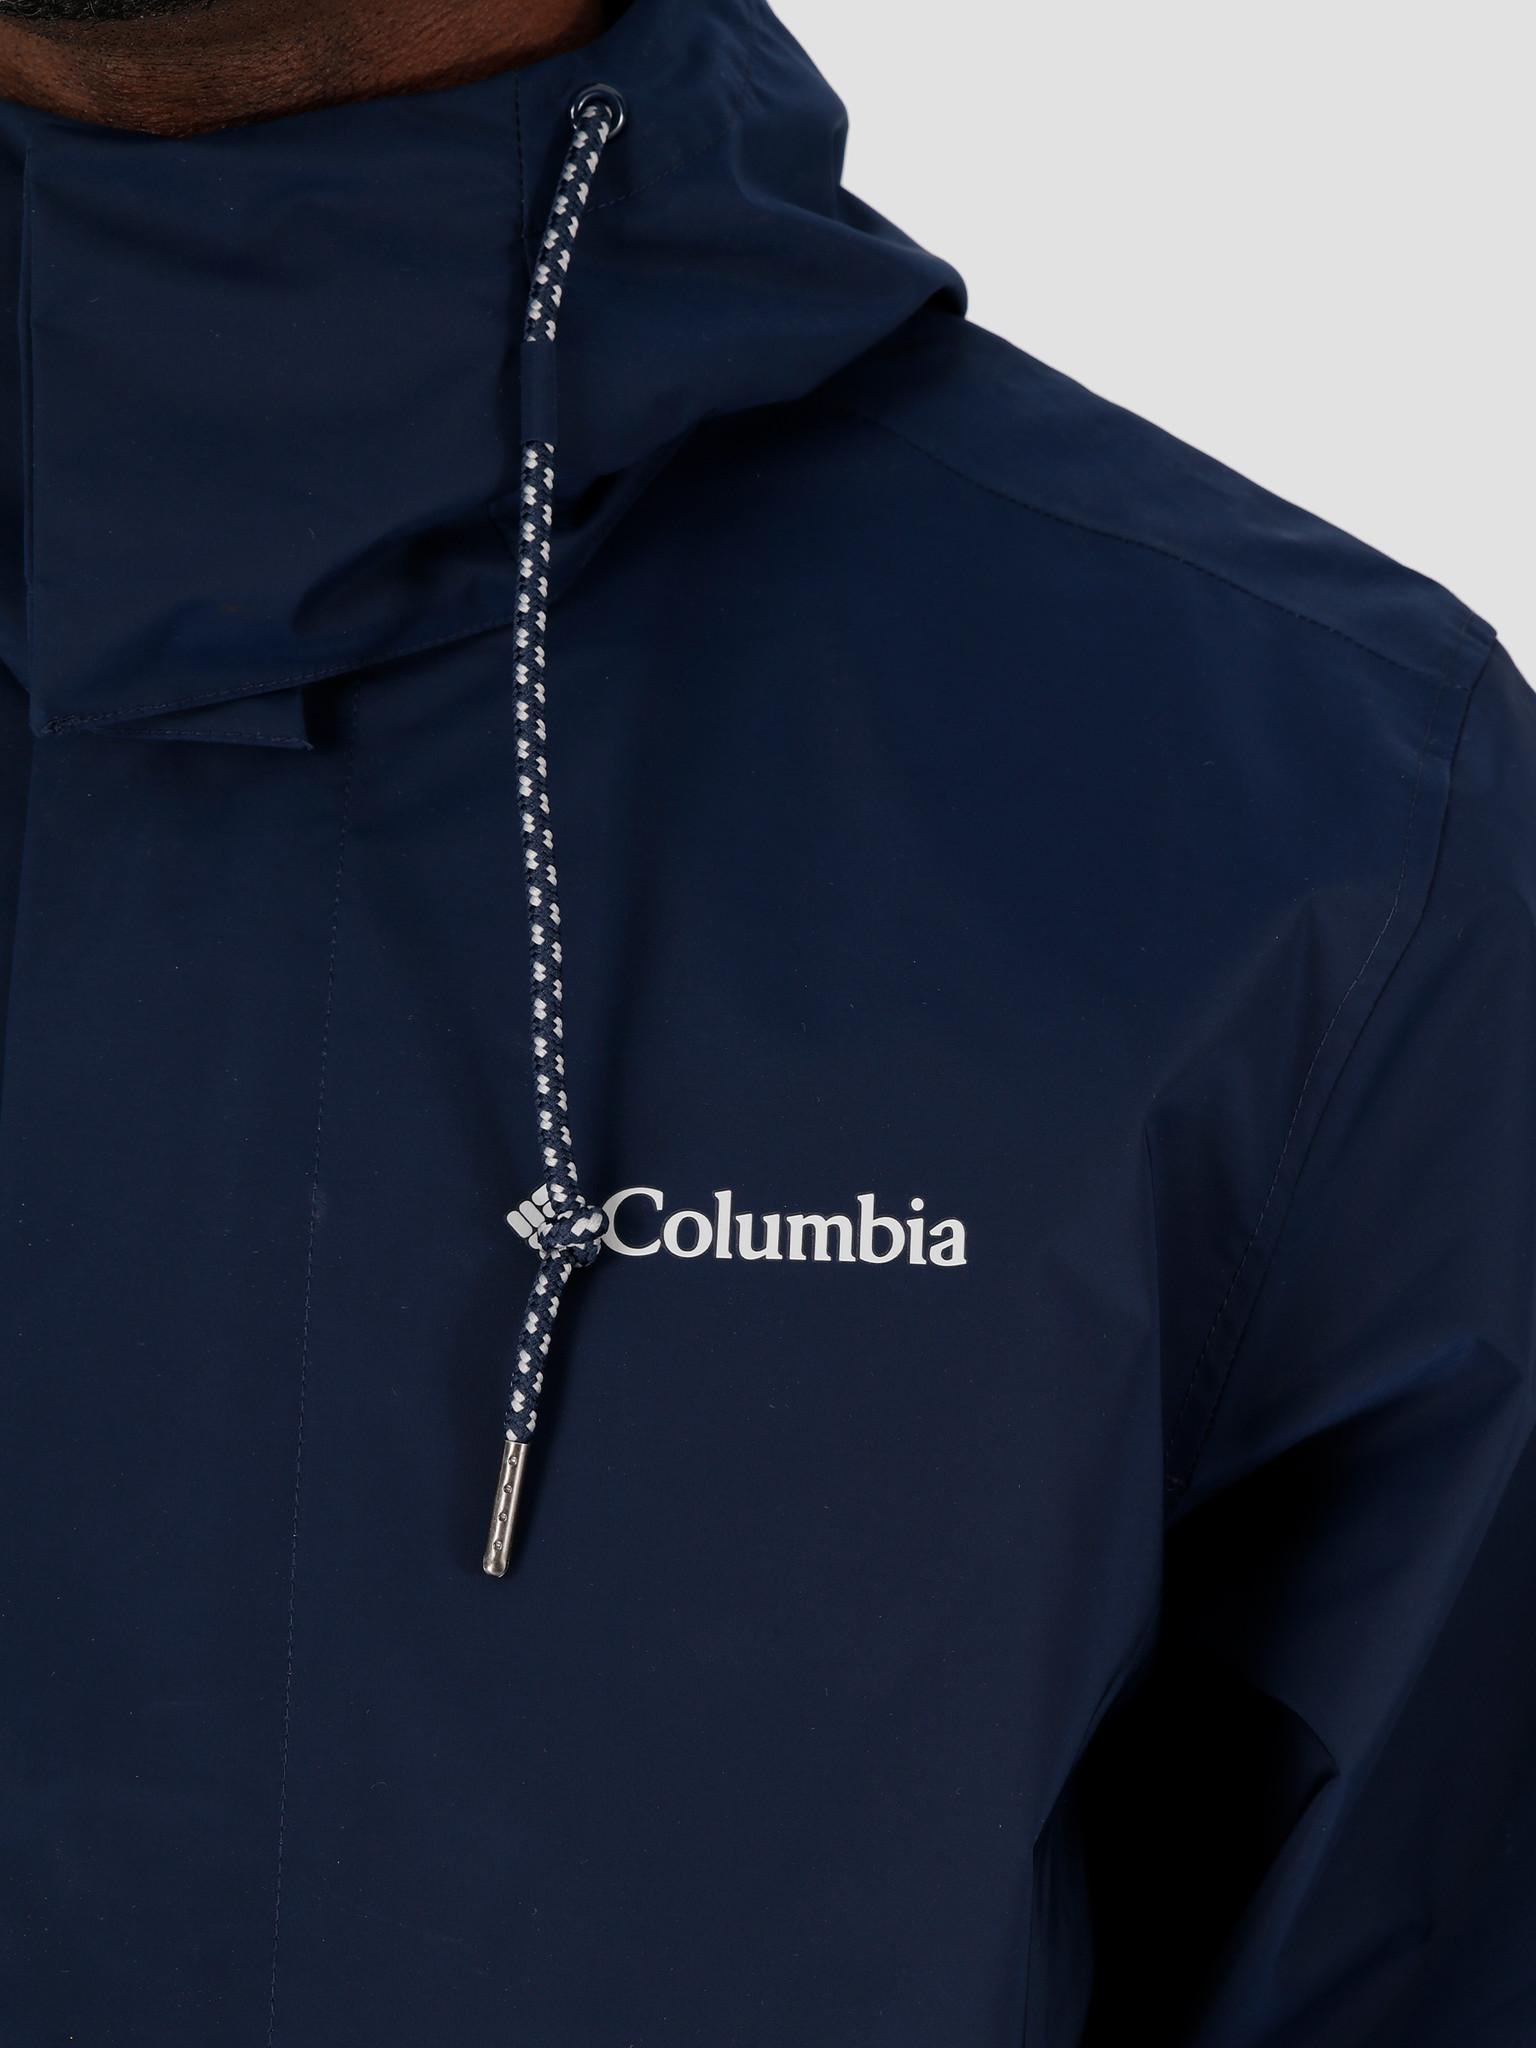 Columbia Columbia East Park Mackintosh Jacket Collegiate Navy 1889313464